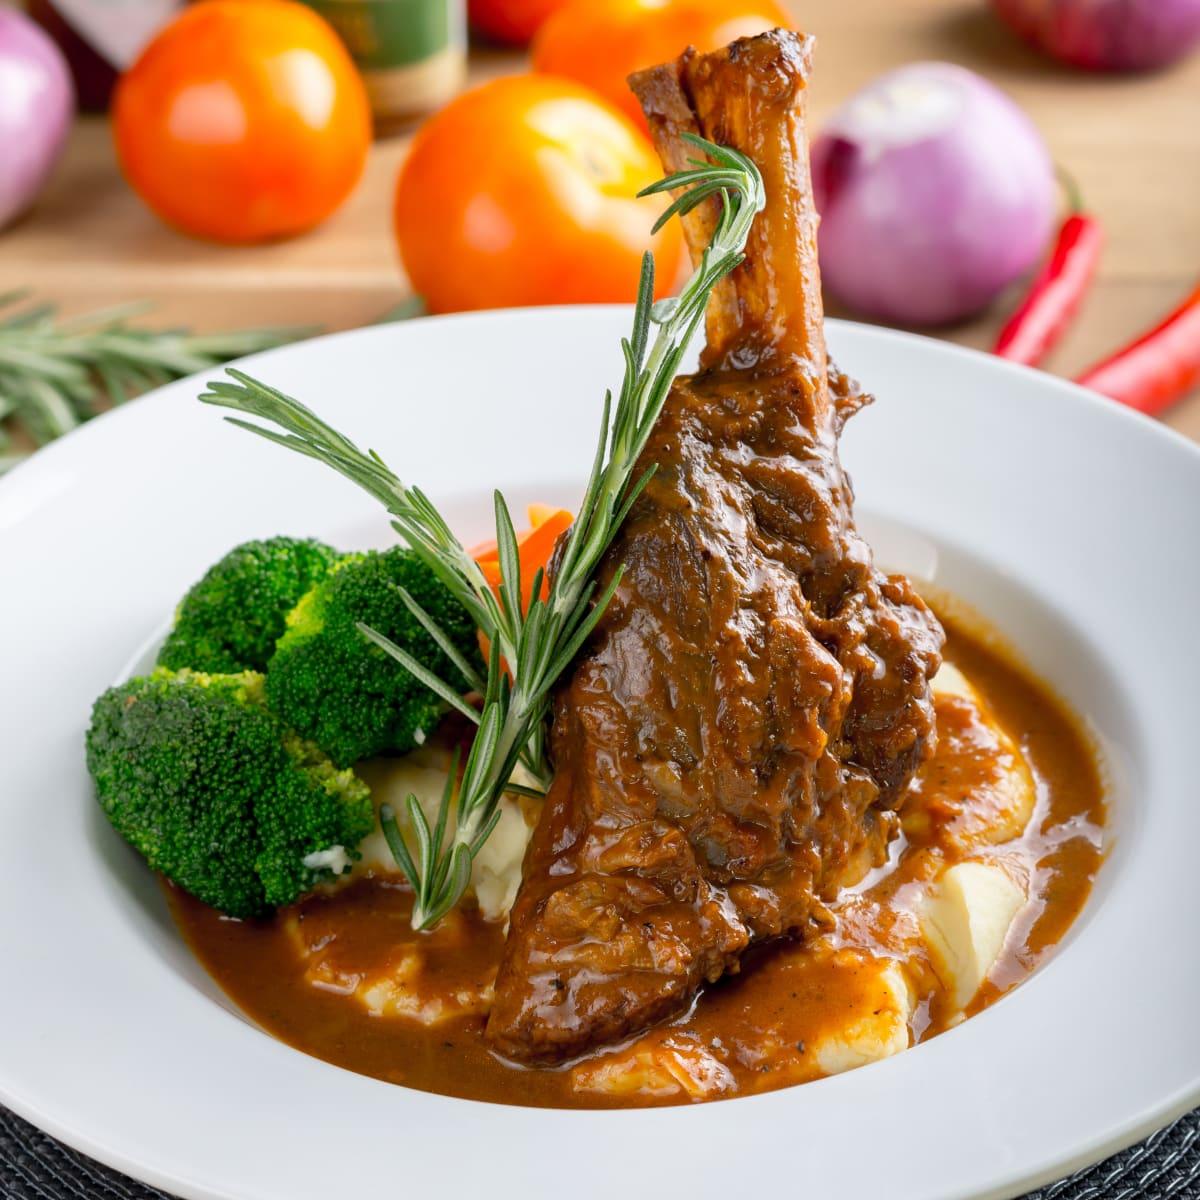 Braised Lamb Shanks Marinated in a Mediterranean Spice Mixture